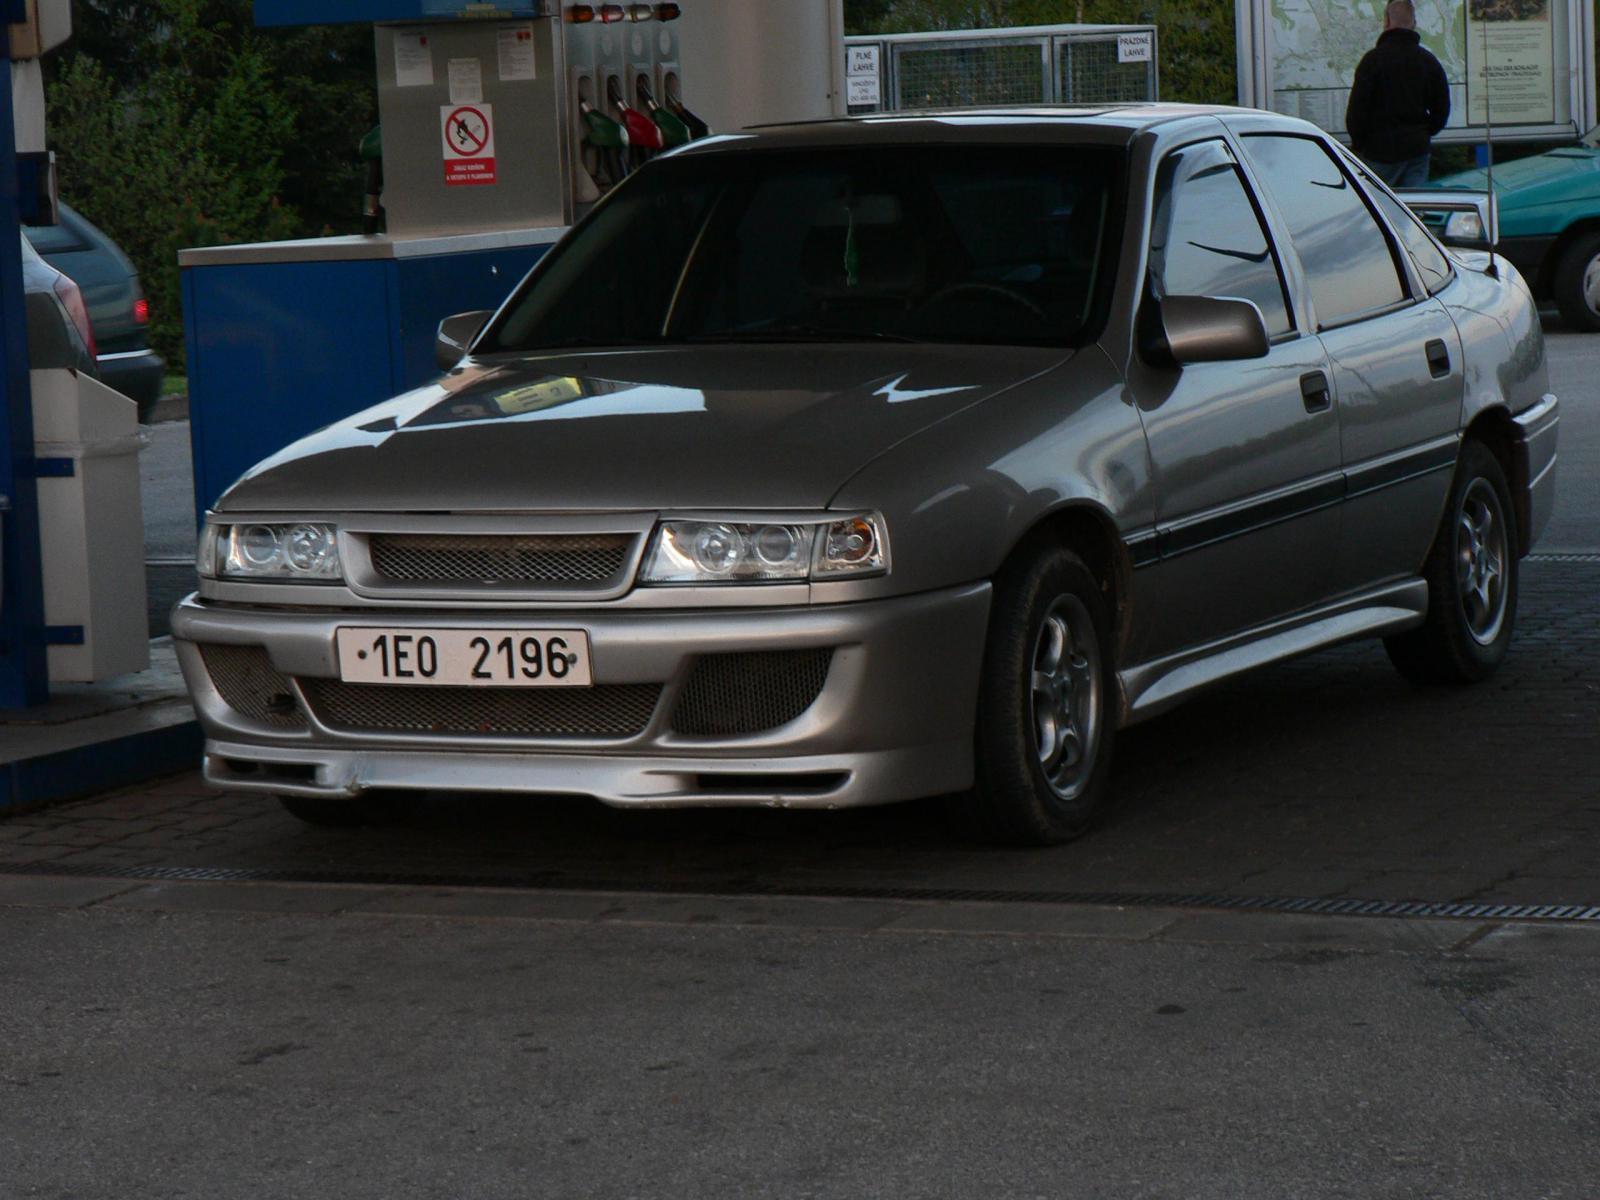 Car detail - Opel Vectra A 1.6